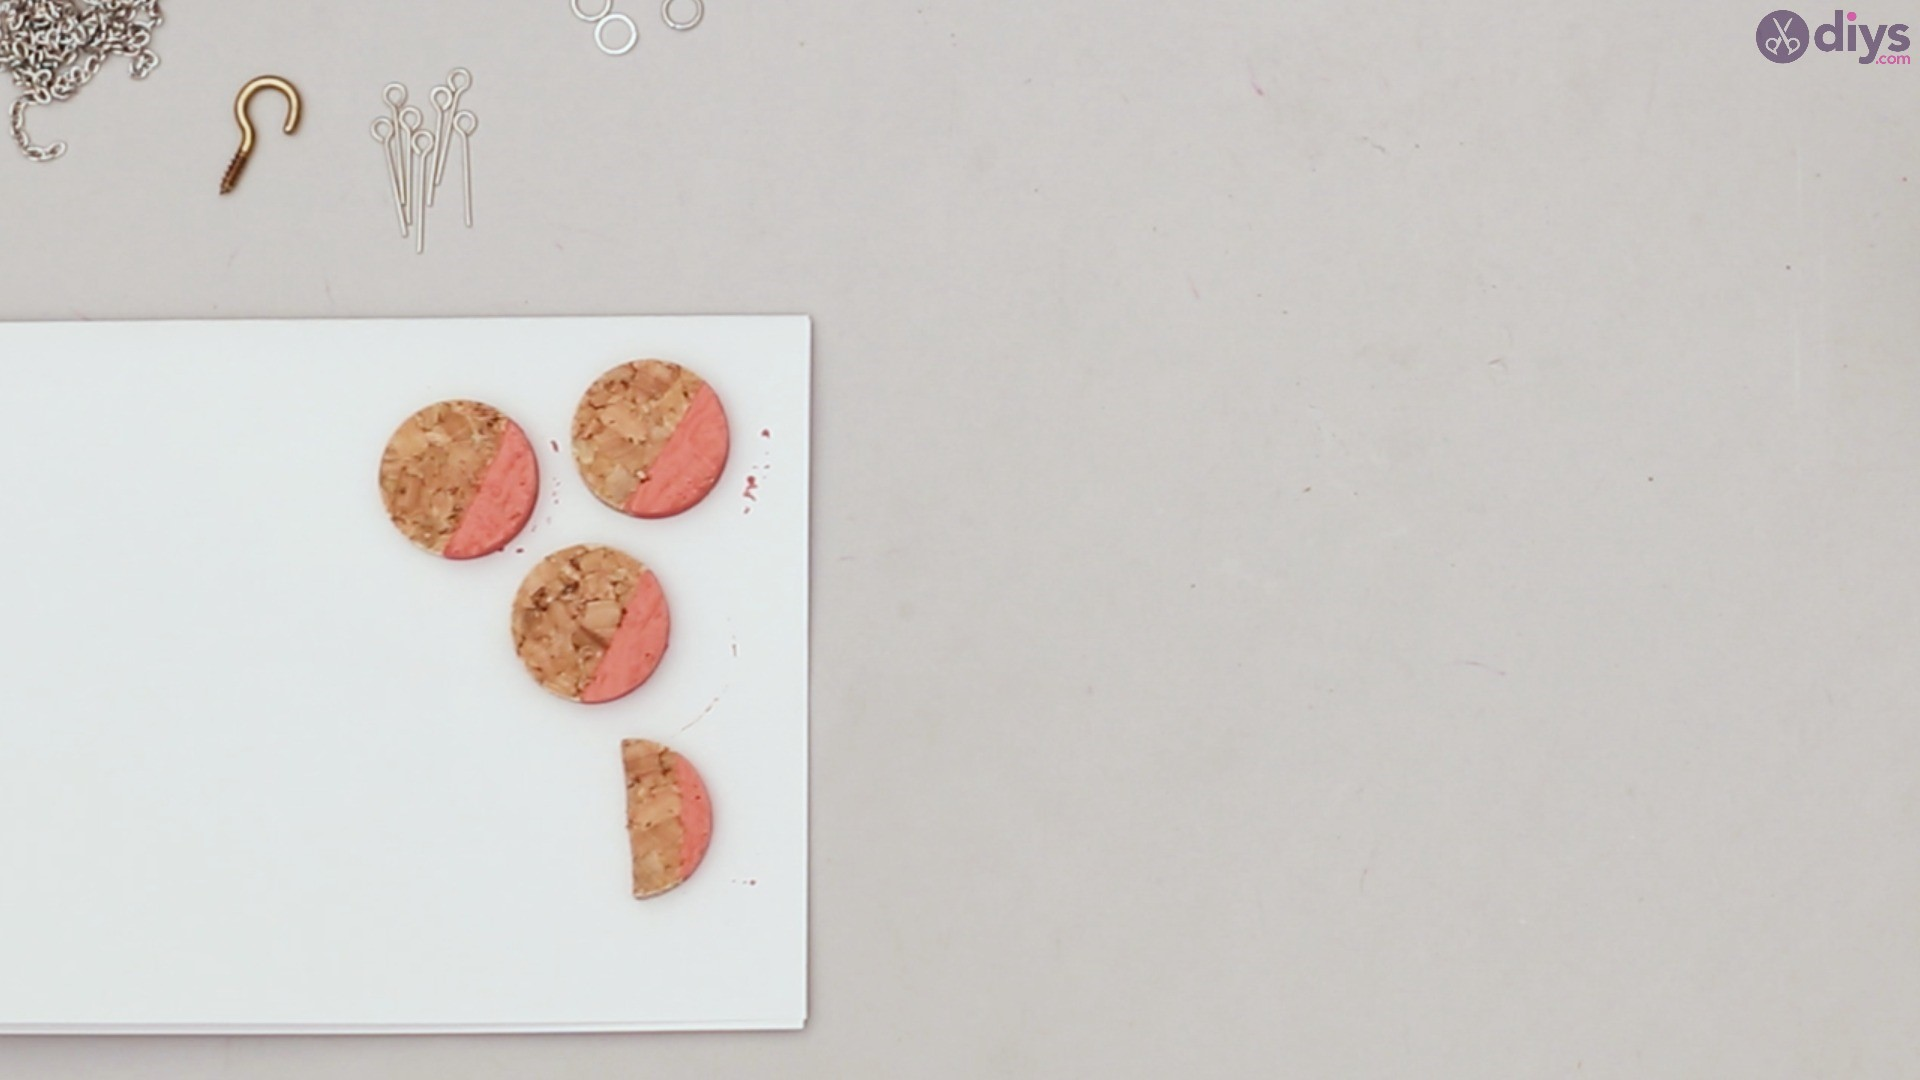 Diy wine cork necklace (10)